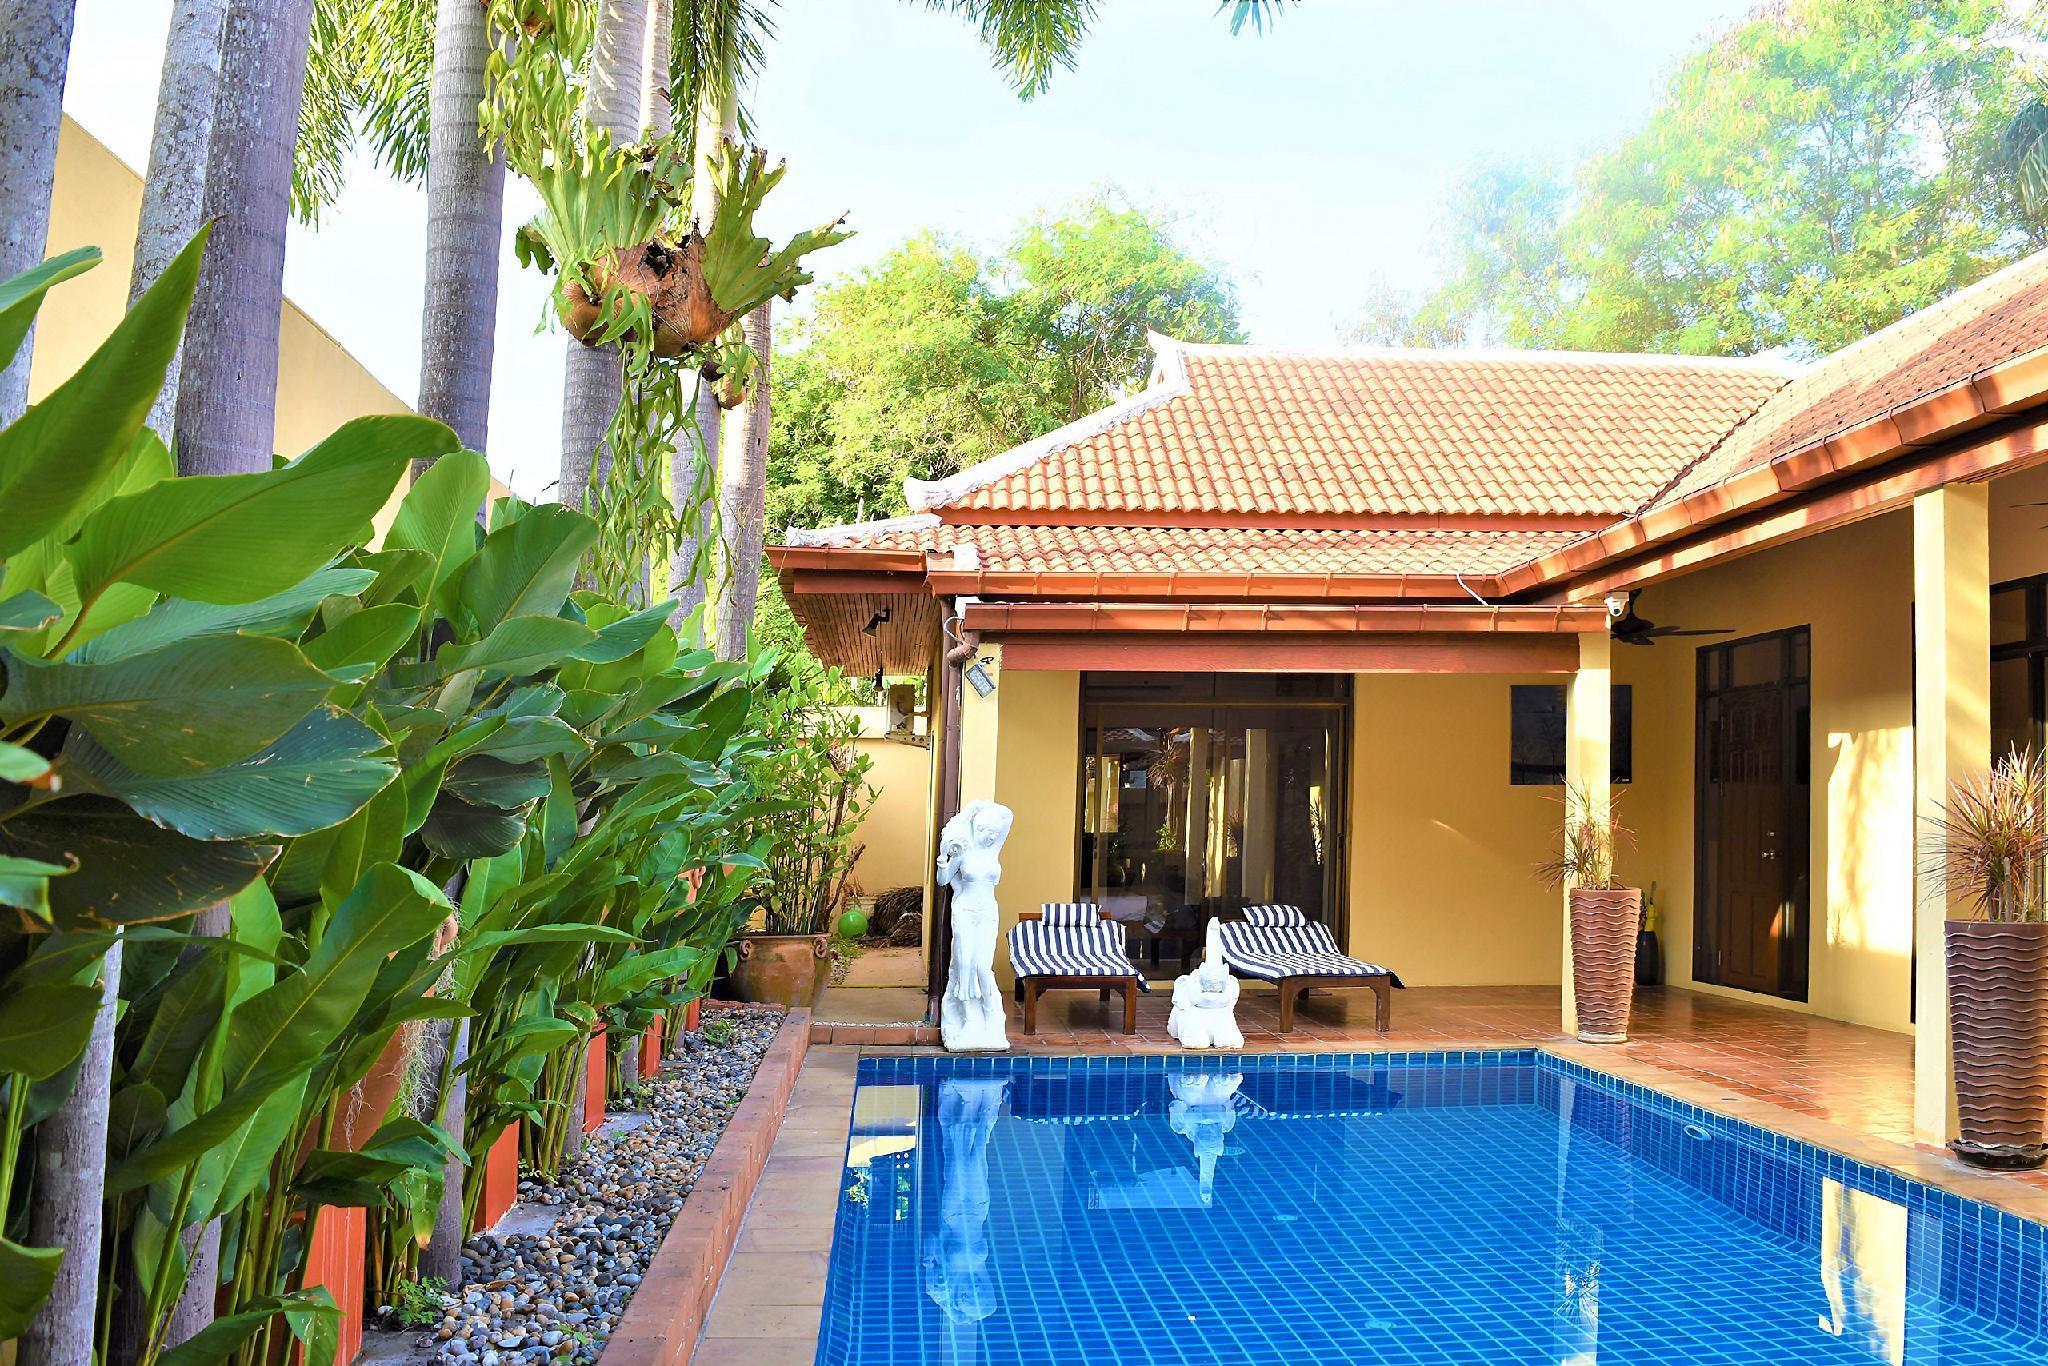 Generous Villa with Private Pool & Tropical Garden วิลลา 4 ห้องนอน 4 ห้องน้ำส่วนตัว ขนาด 588 ตร.ม. – หาดจอมเทียน